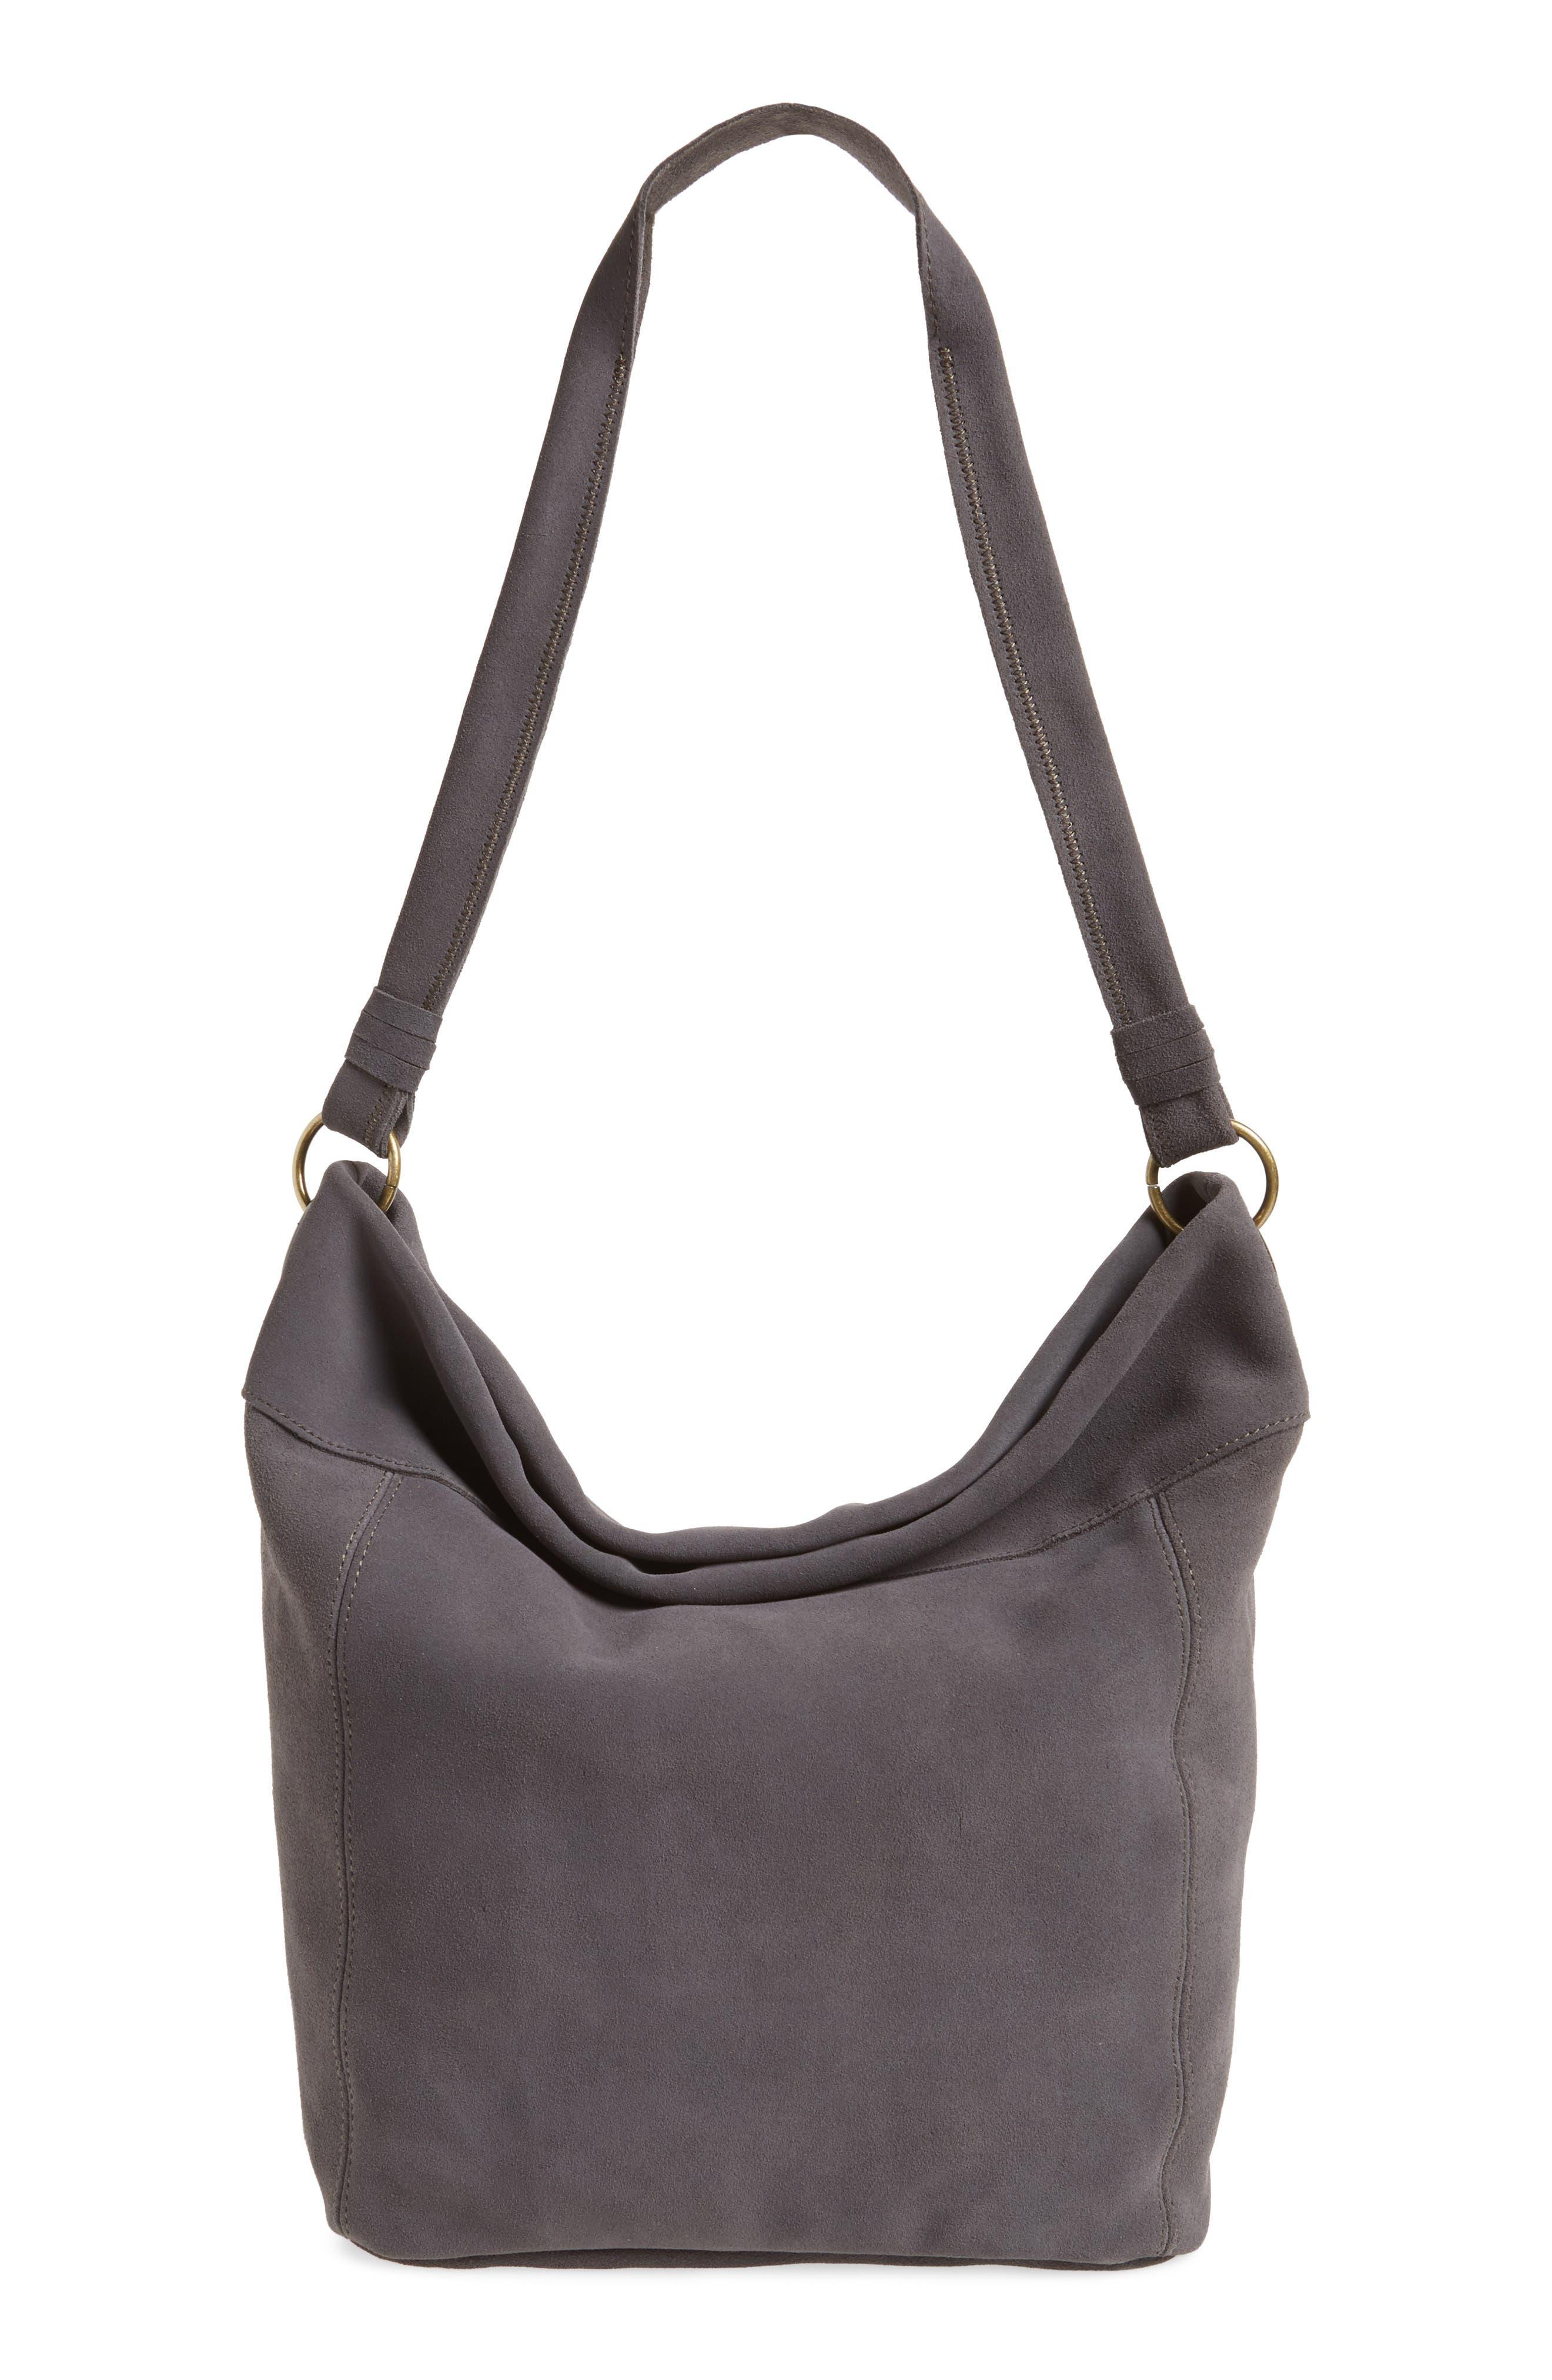 Grey Hobo Bags & Purses | Nordstrom